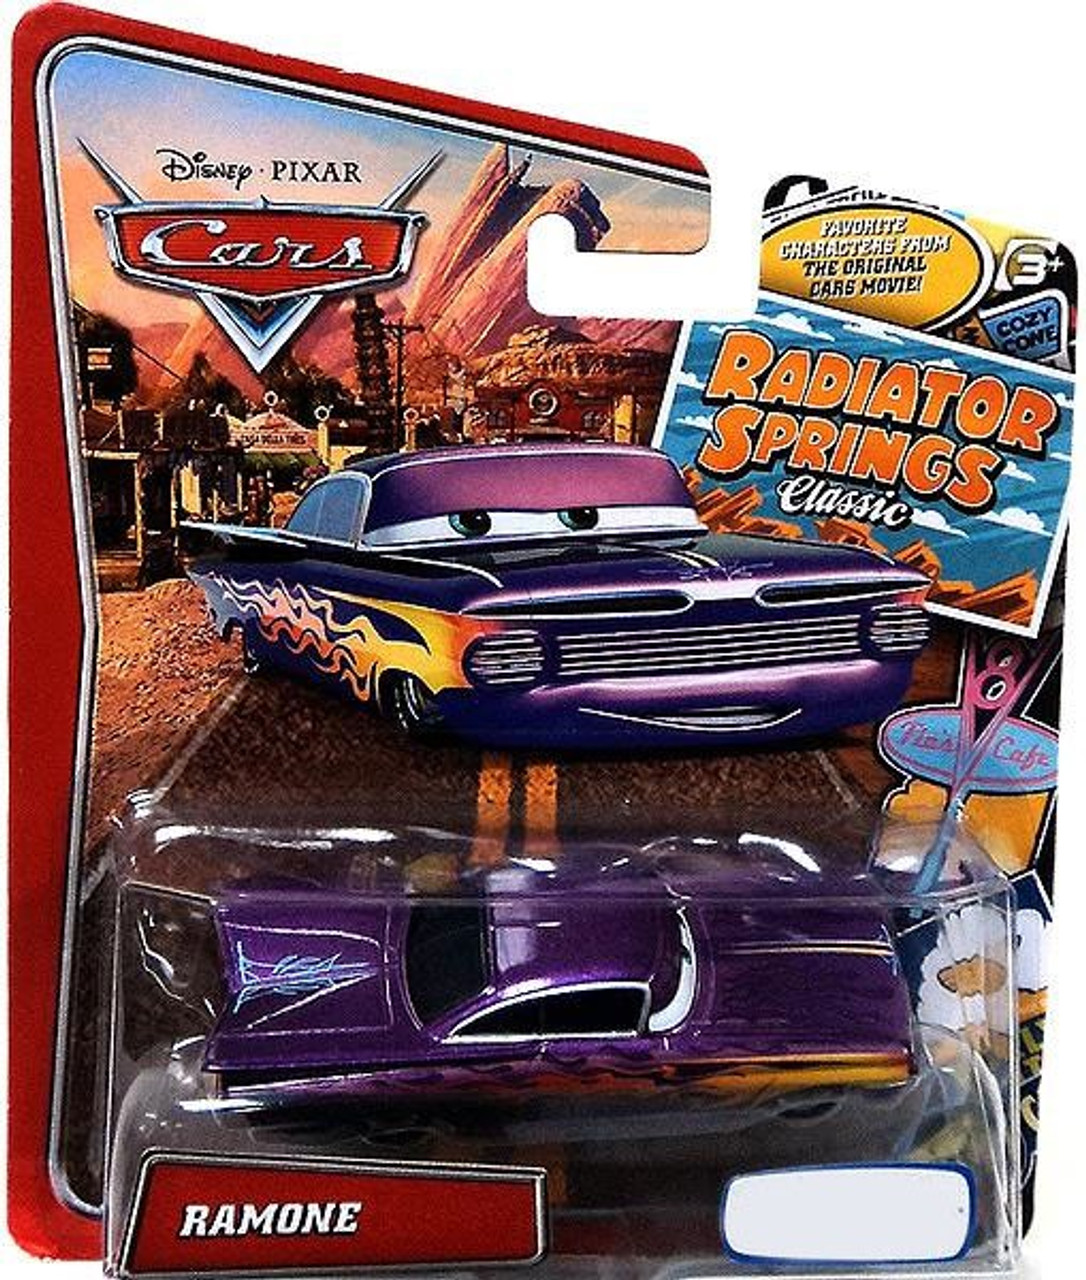 Disney Pixar Cars Radiator Springs Classic Ramone Exclusive 155